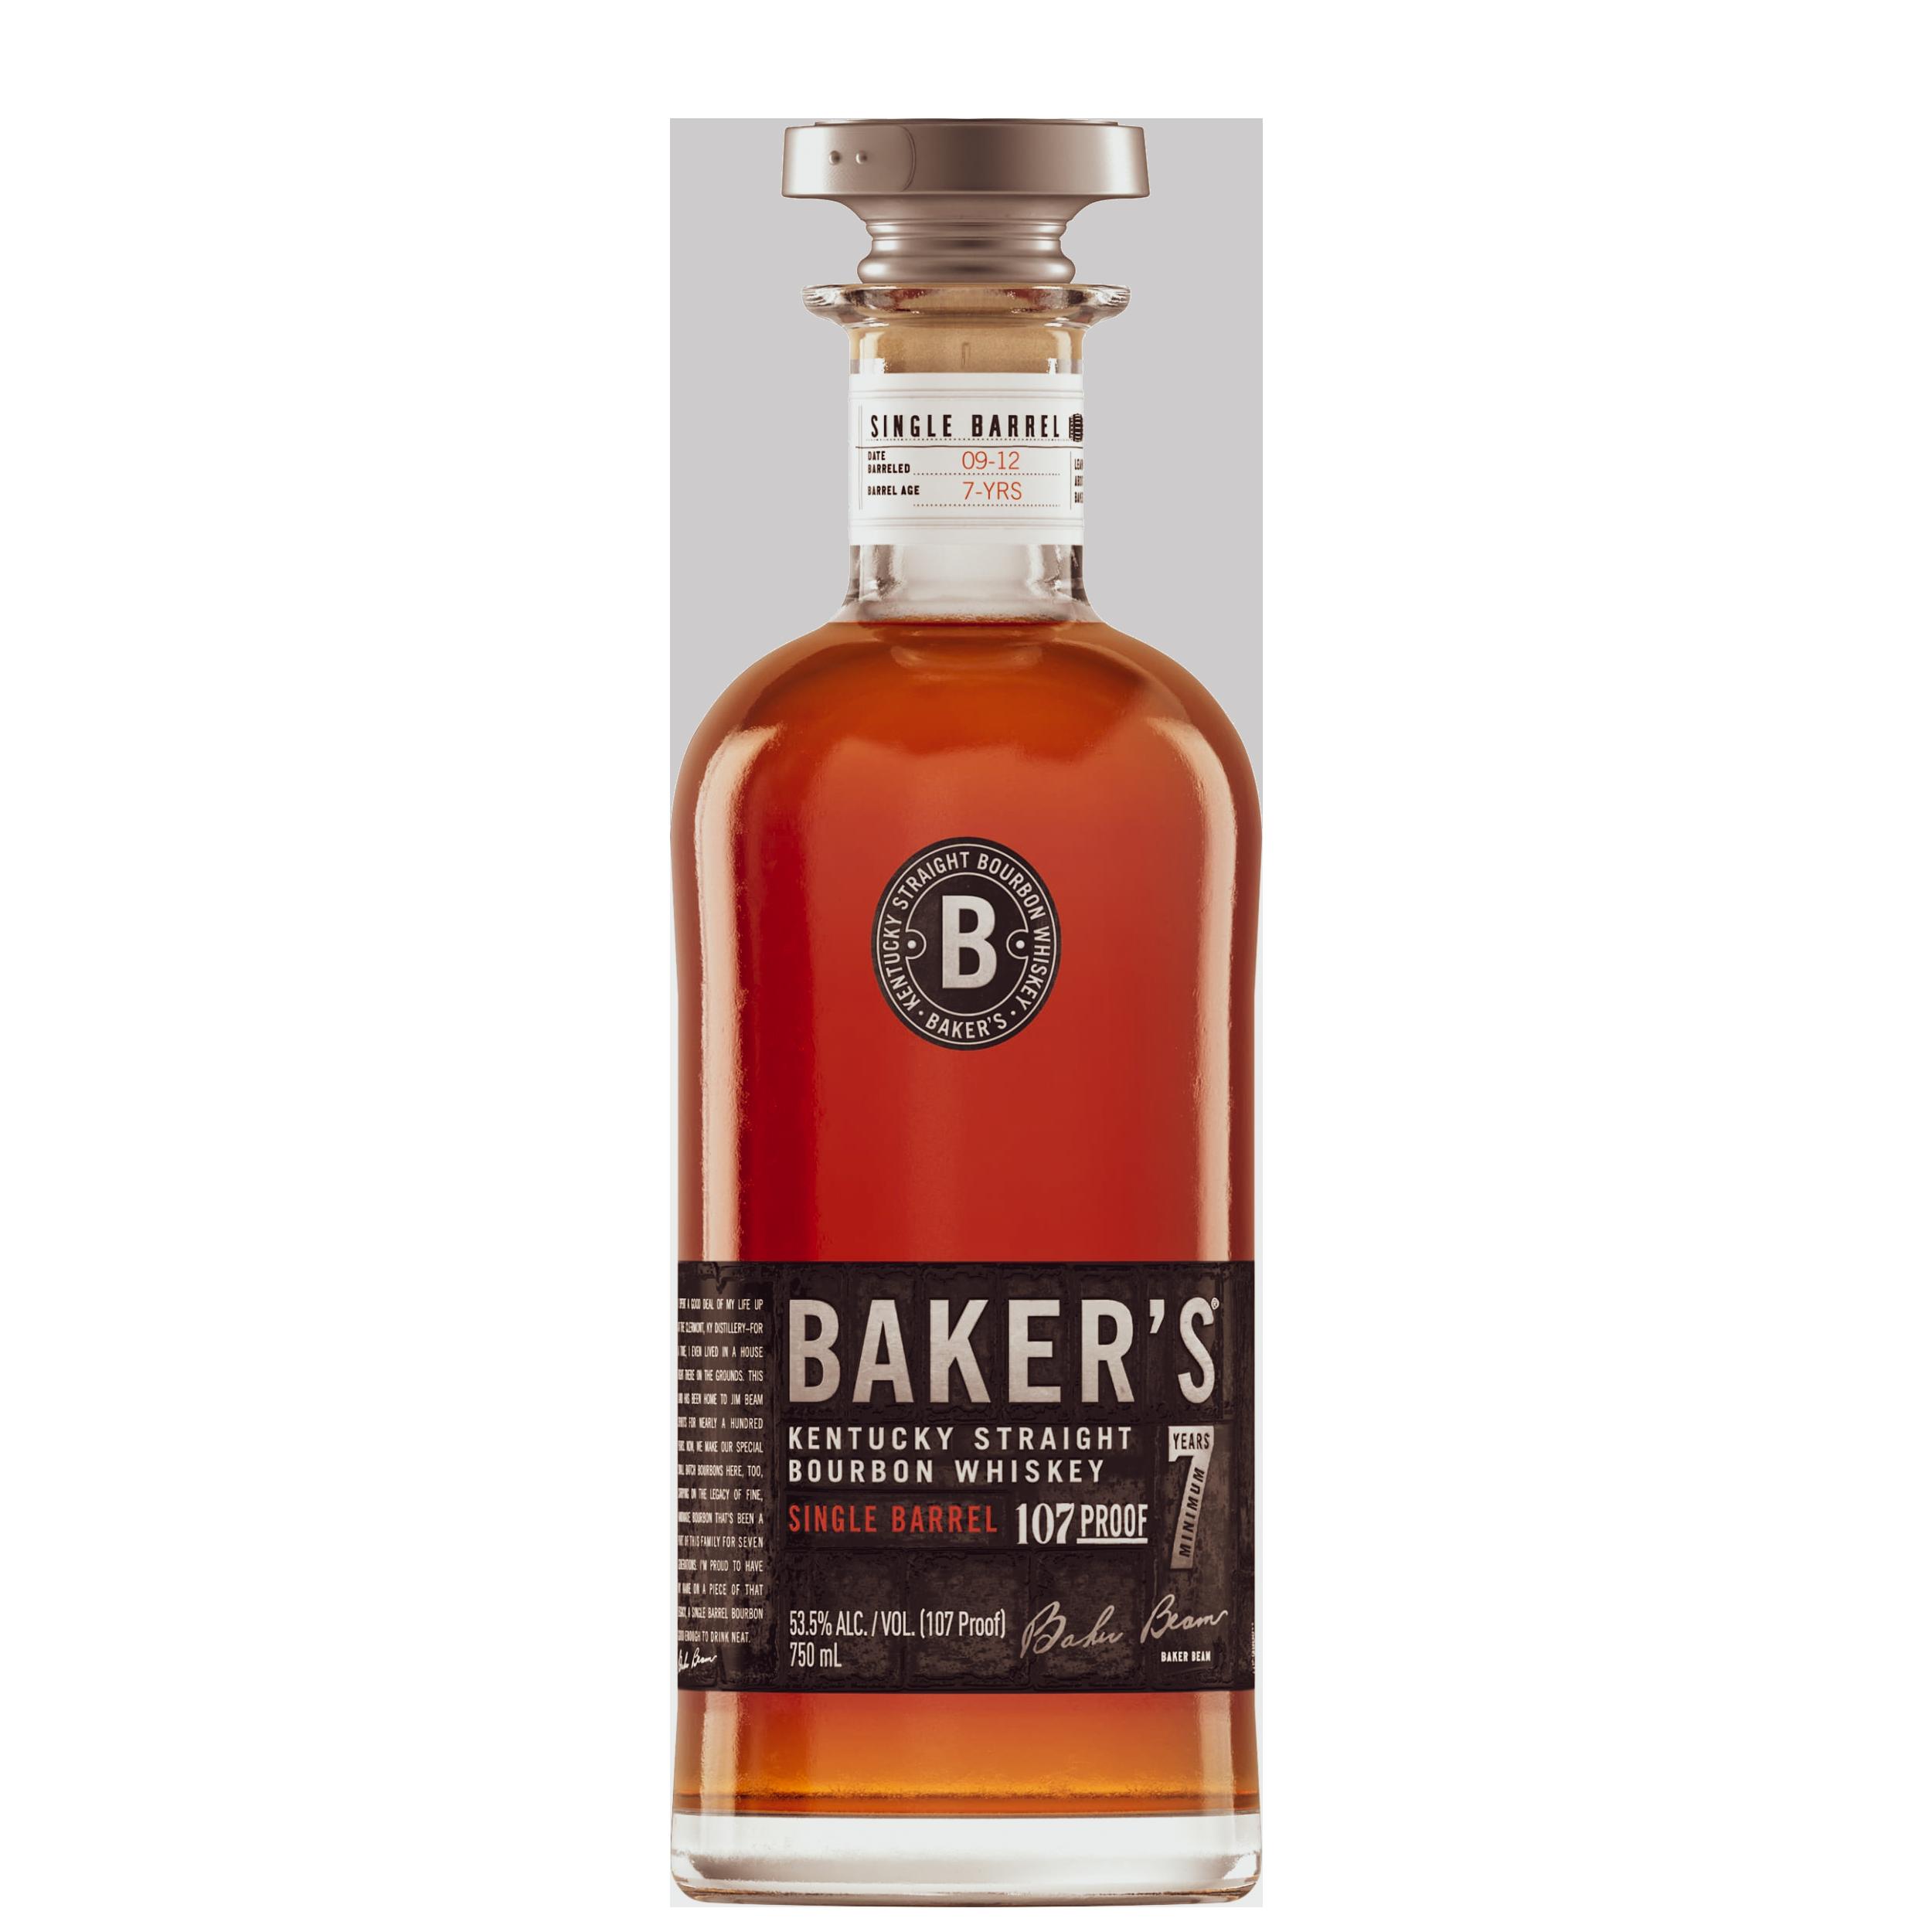 Baker's 7 Year Kentucky Straight Bourbon Single Barrel